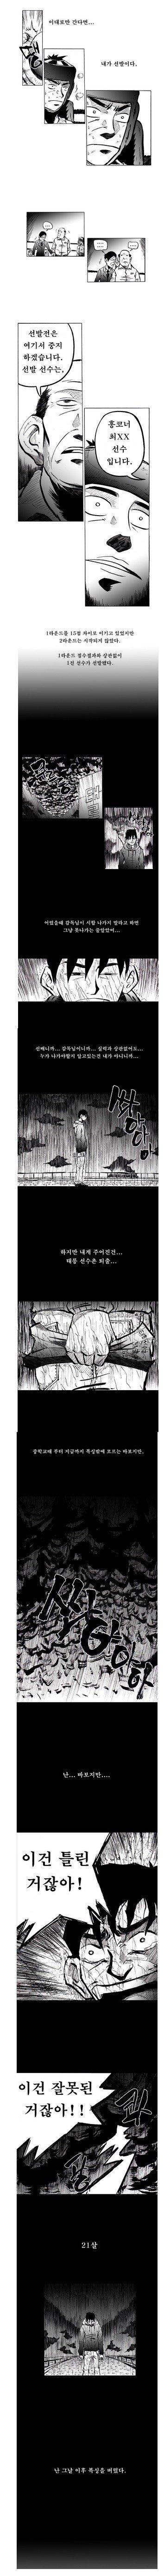 2.jpg 한국 복싱계의 더러운 현실.jpg